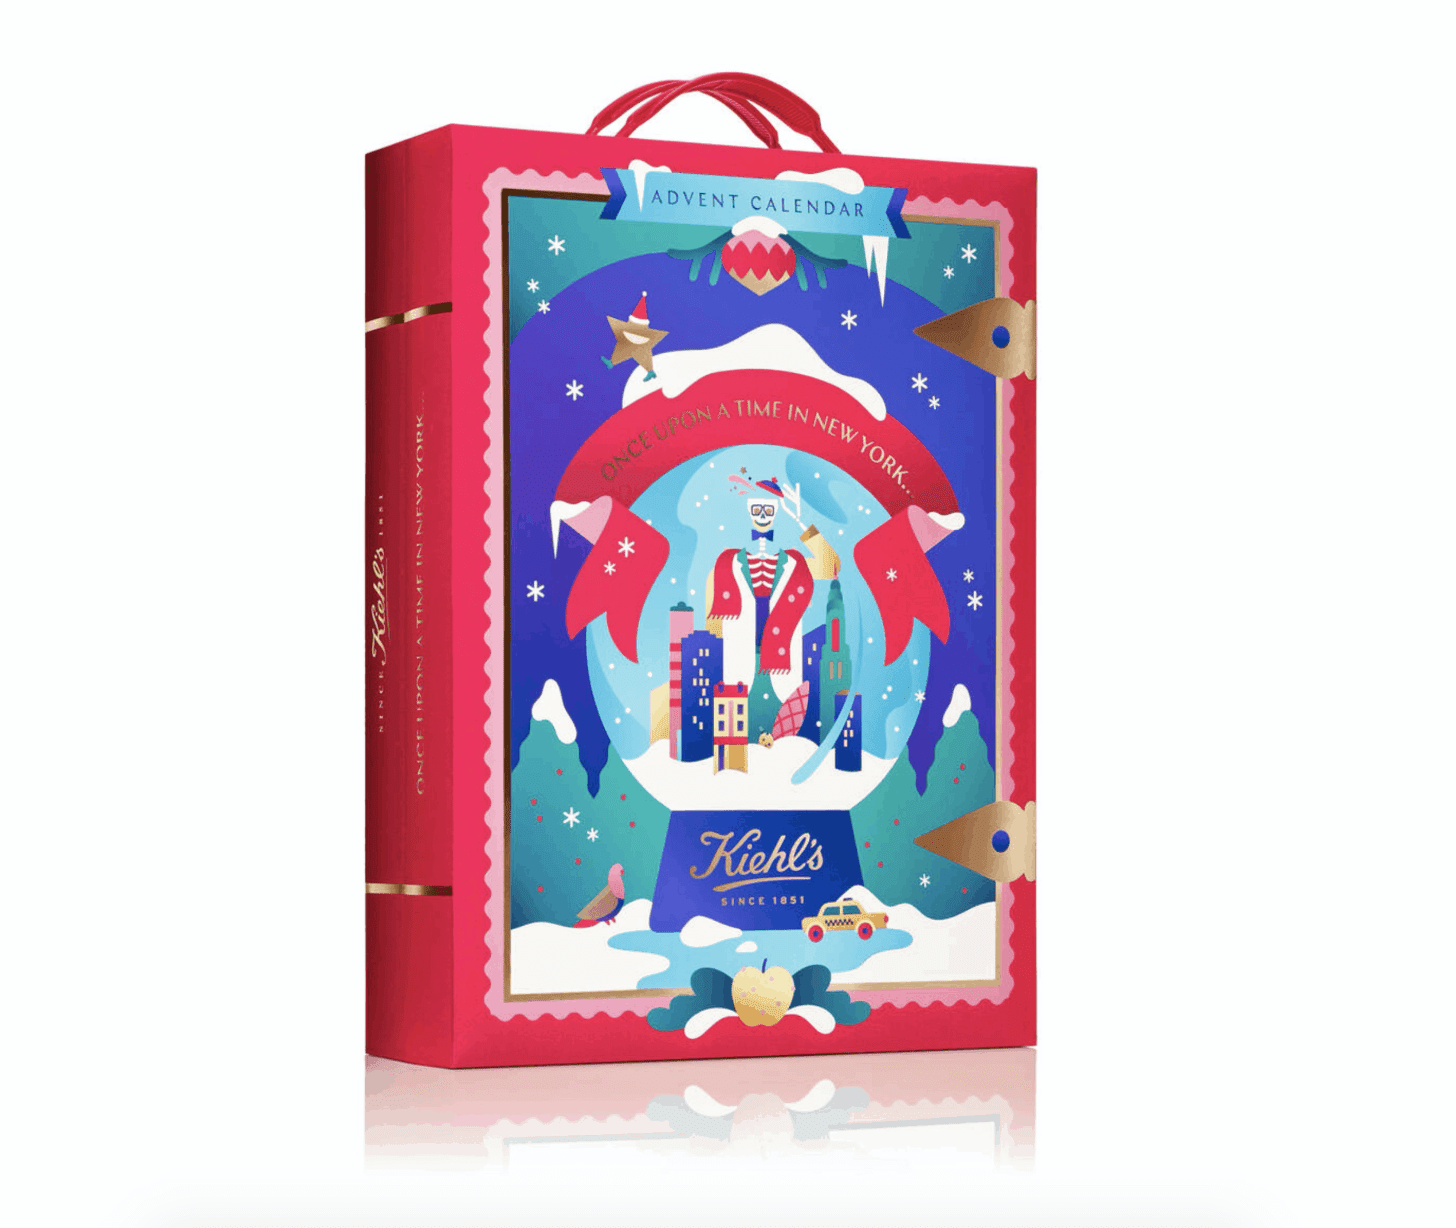 Kiehl's Limited Edition Skincare Advent Calendar